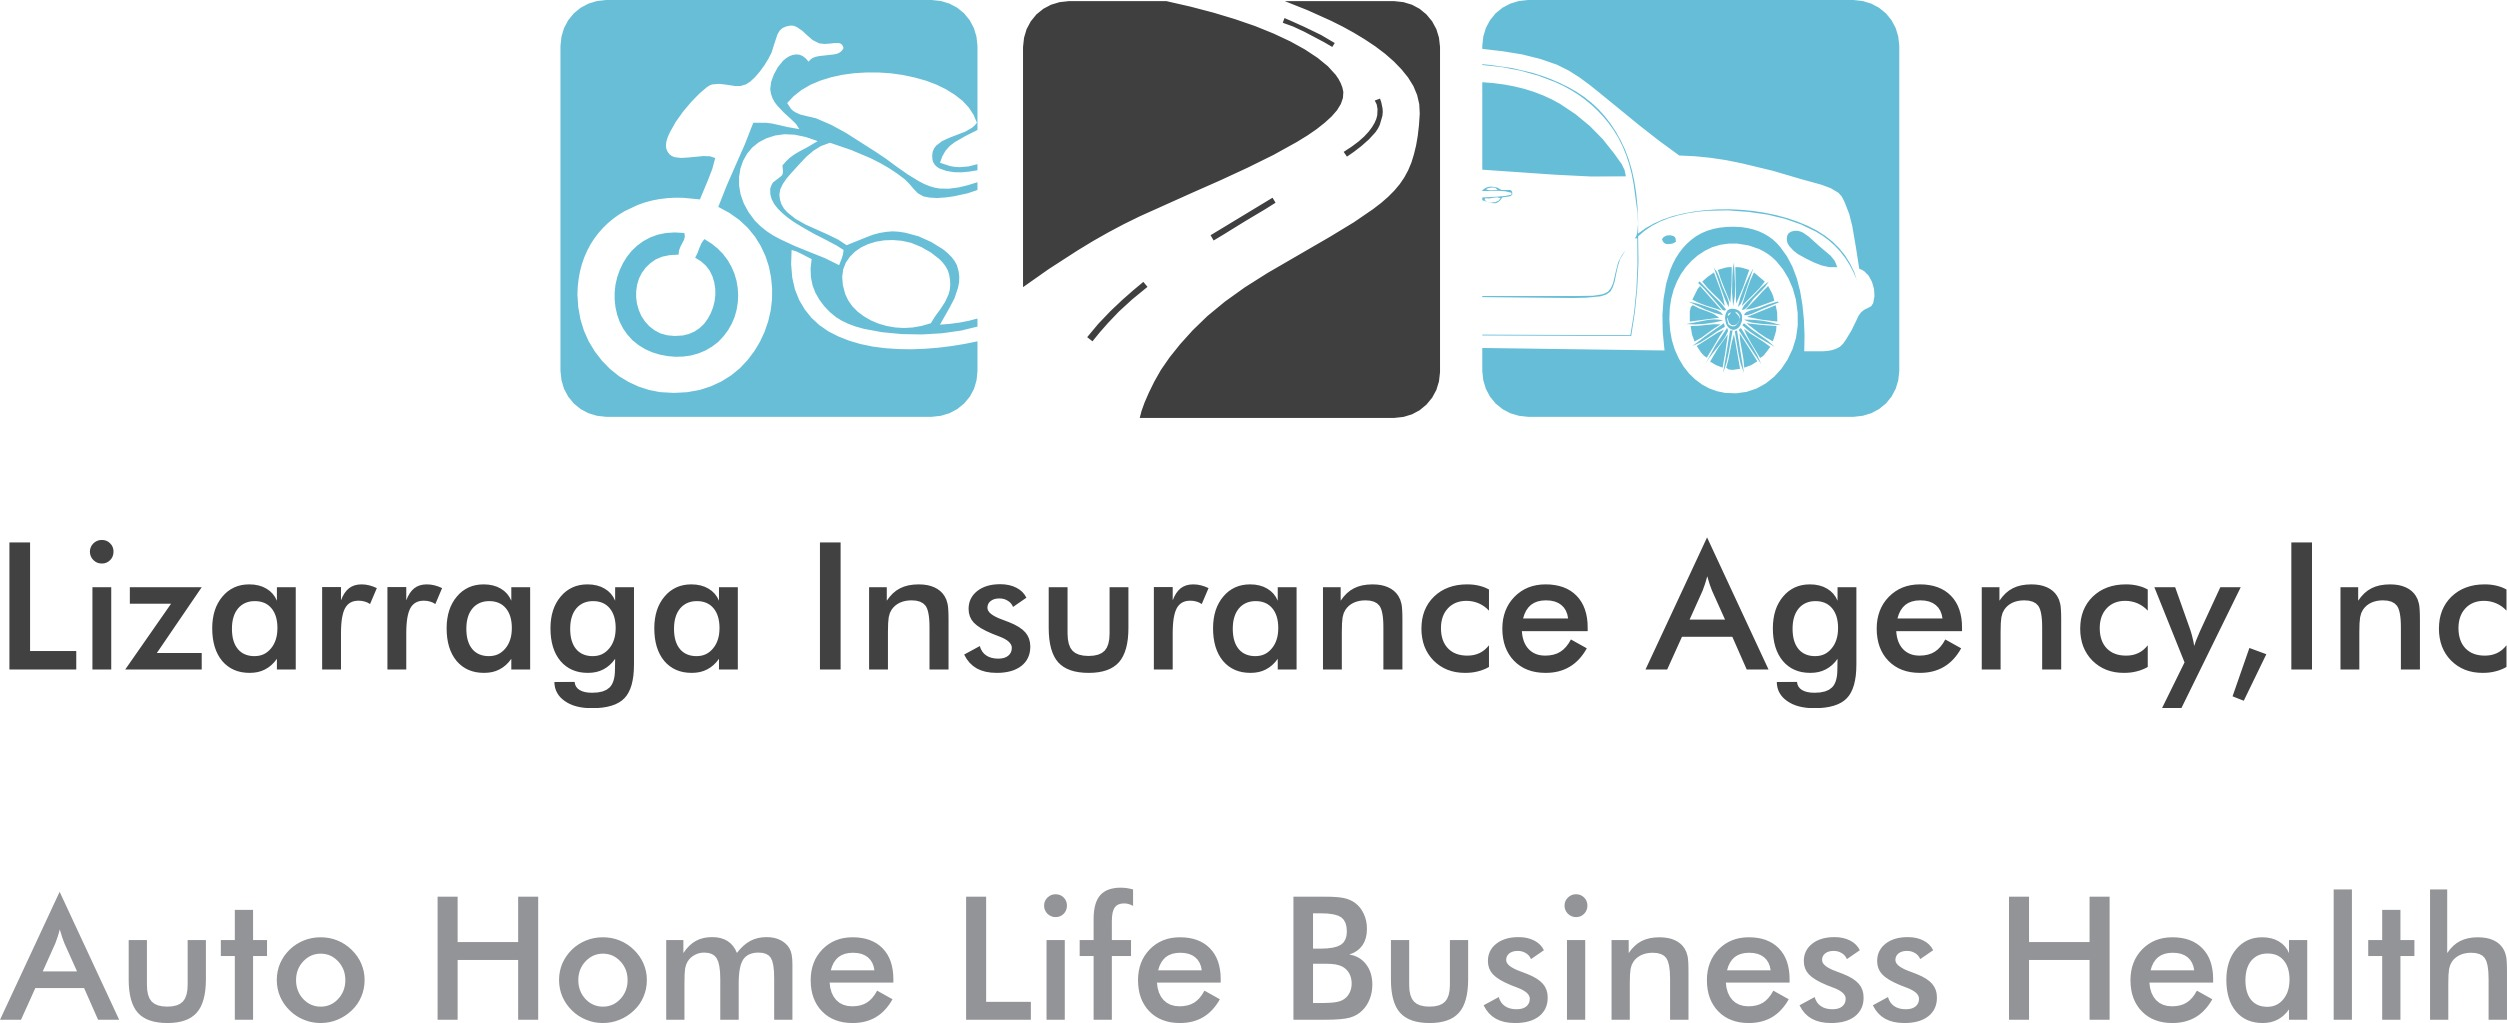 Lizarraga Insurance Agency Inc